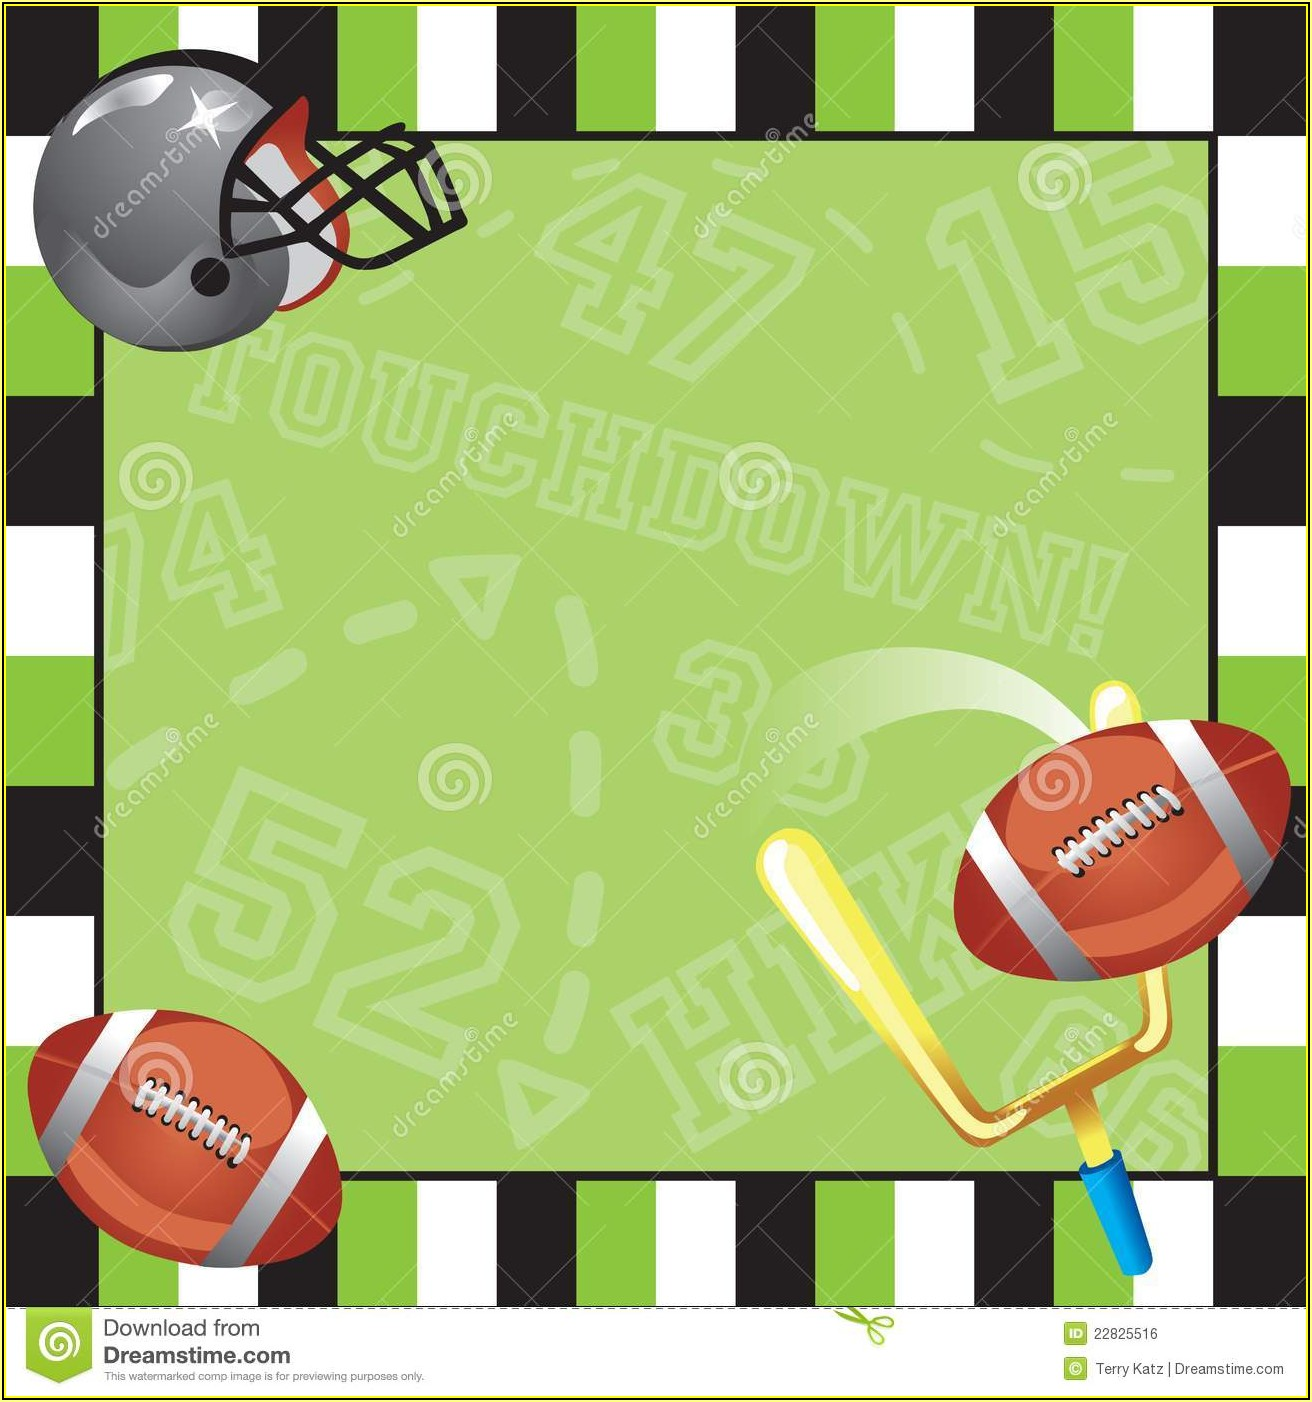 Football Party Invitations Templates Free